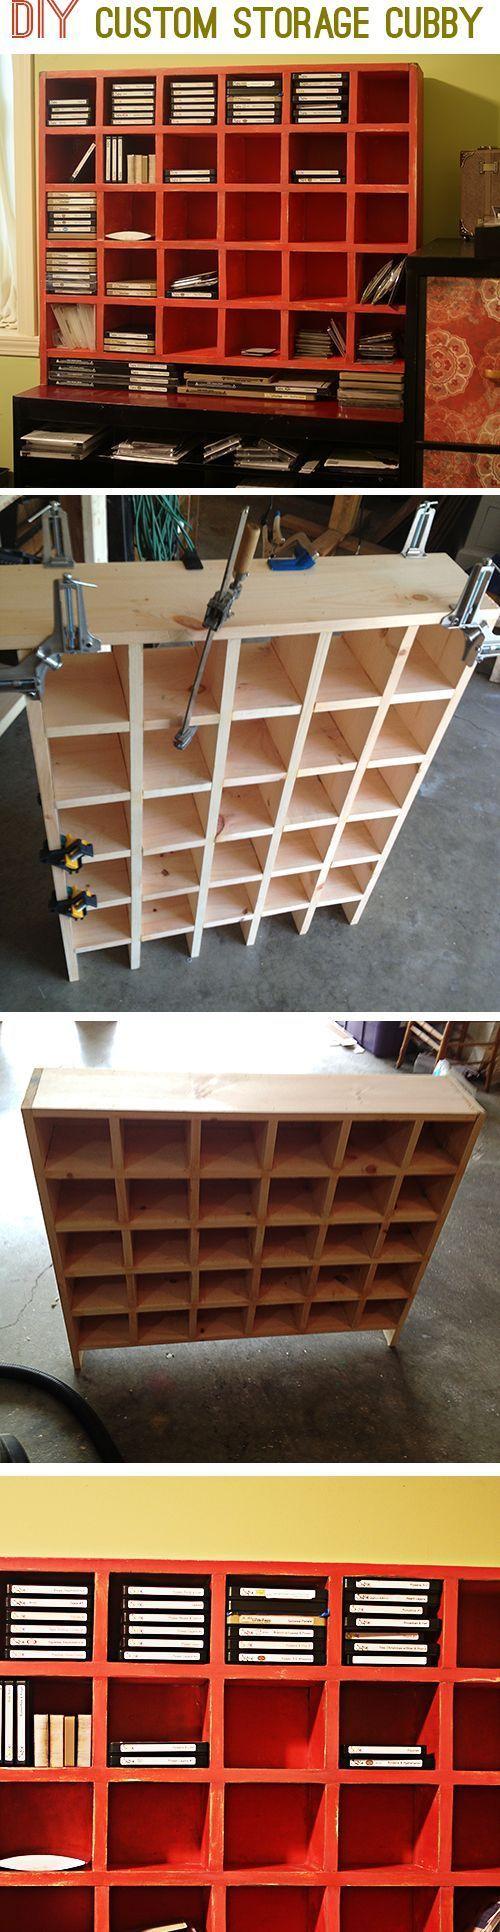 Best 25+ Cd shelf ideas on Pinterest | DIY woodworking books ...